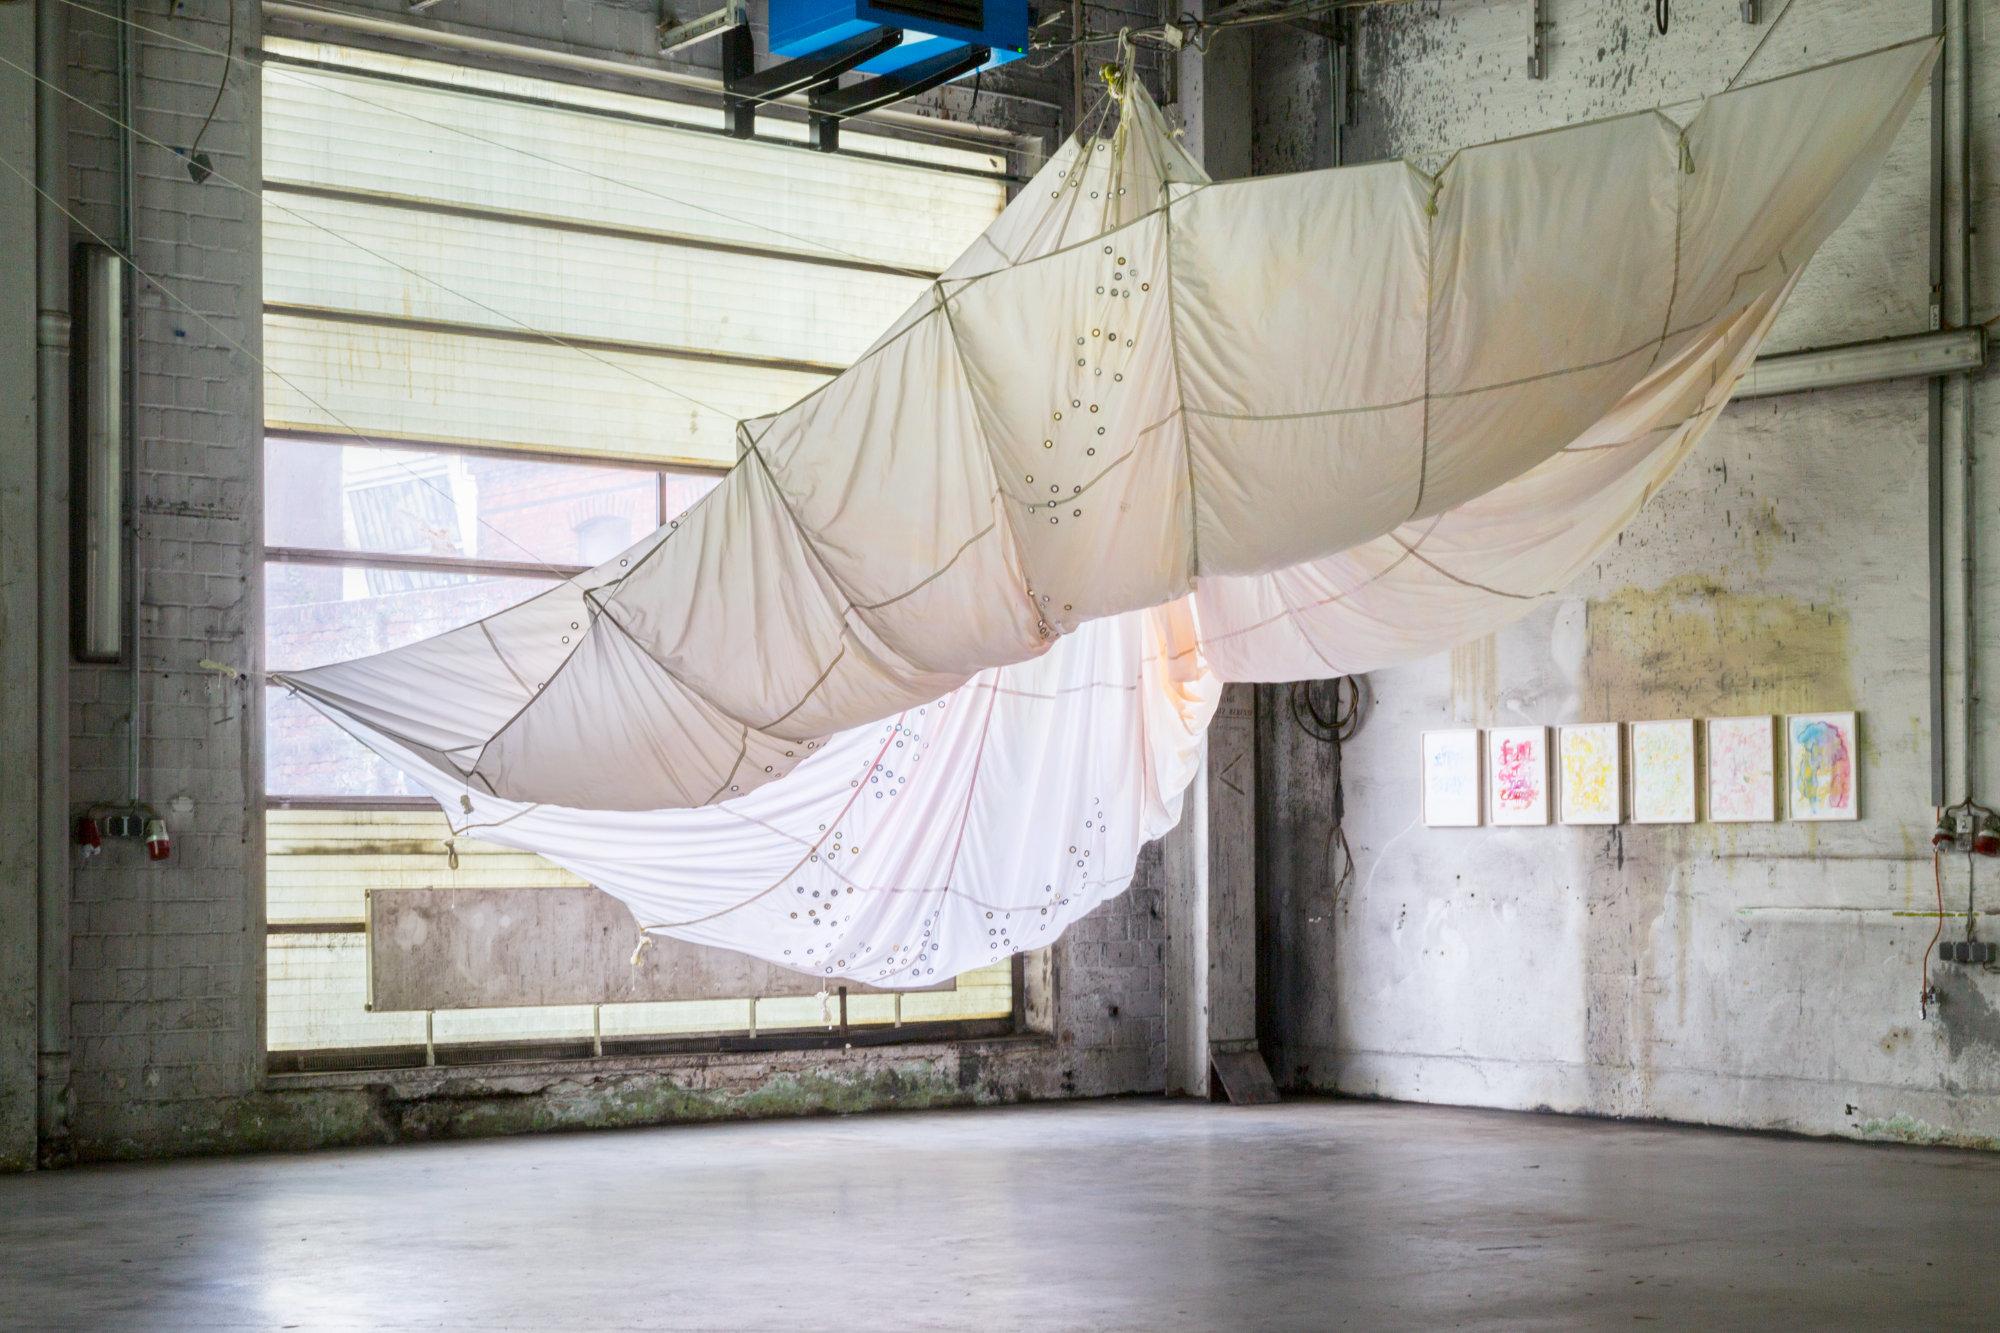 <p>Installationsansicht Markues, Foto: Anastasia Muna</p>